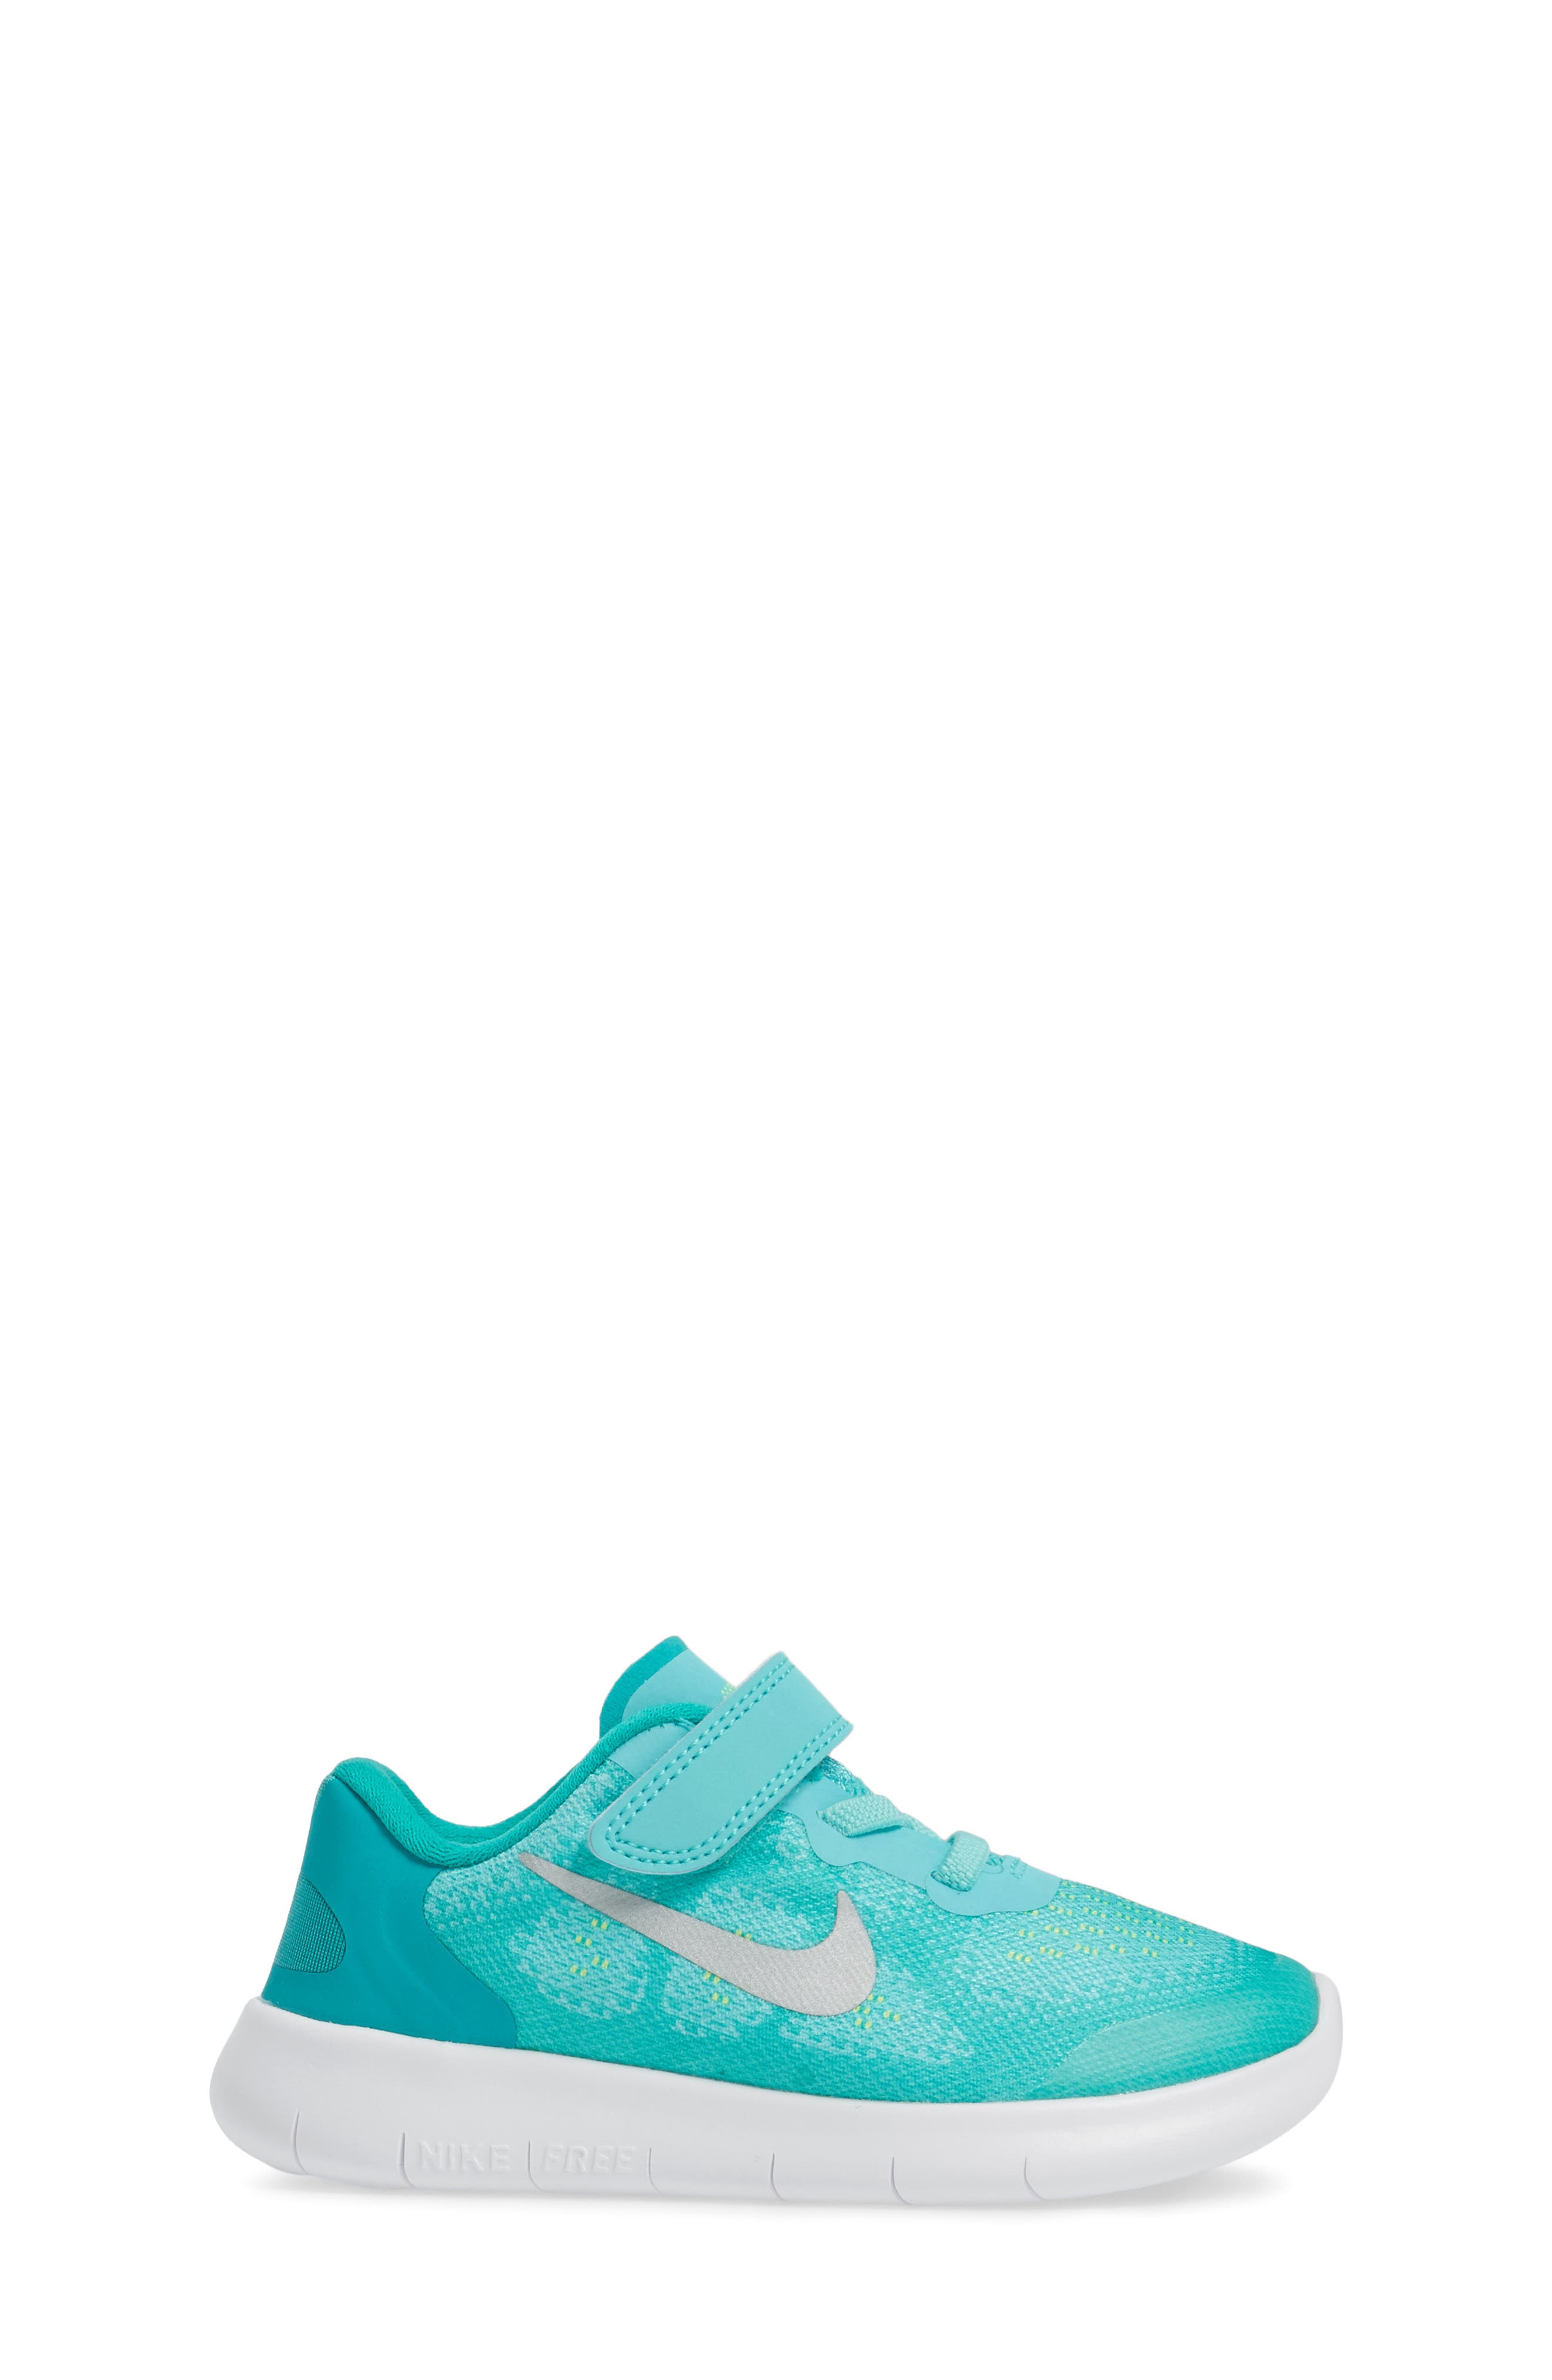 Alternate Image 3  - Nike Free Run 2017 Sneaker (Baby, Walker, Toddler & Little Kid)